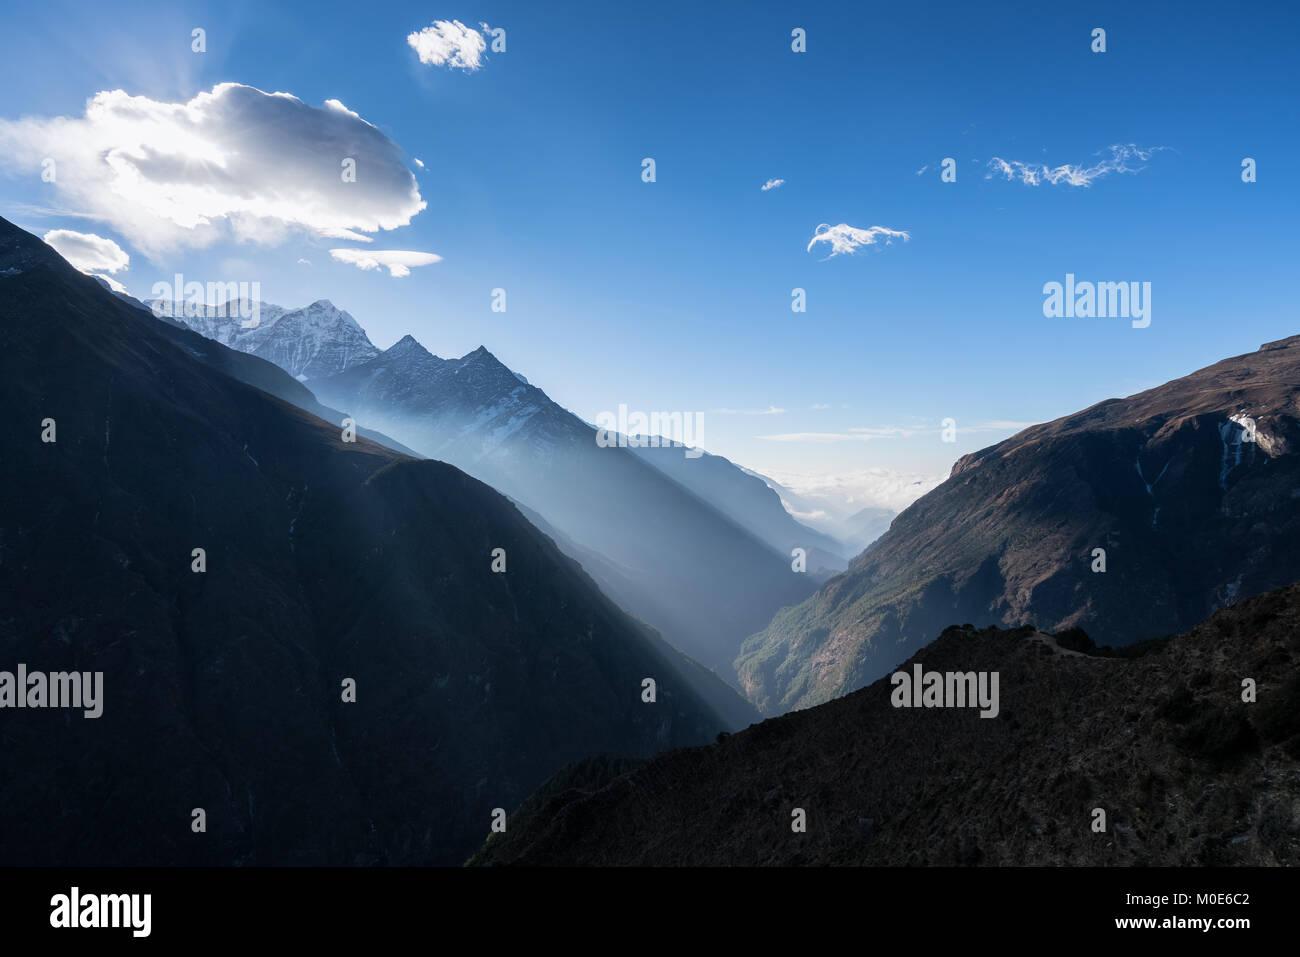 Khumbu valley views near Namche Bazaar, Nepal - Stock Image